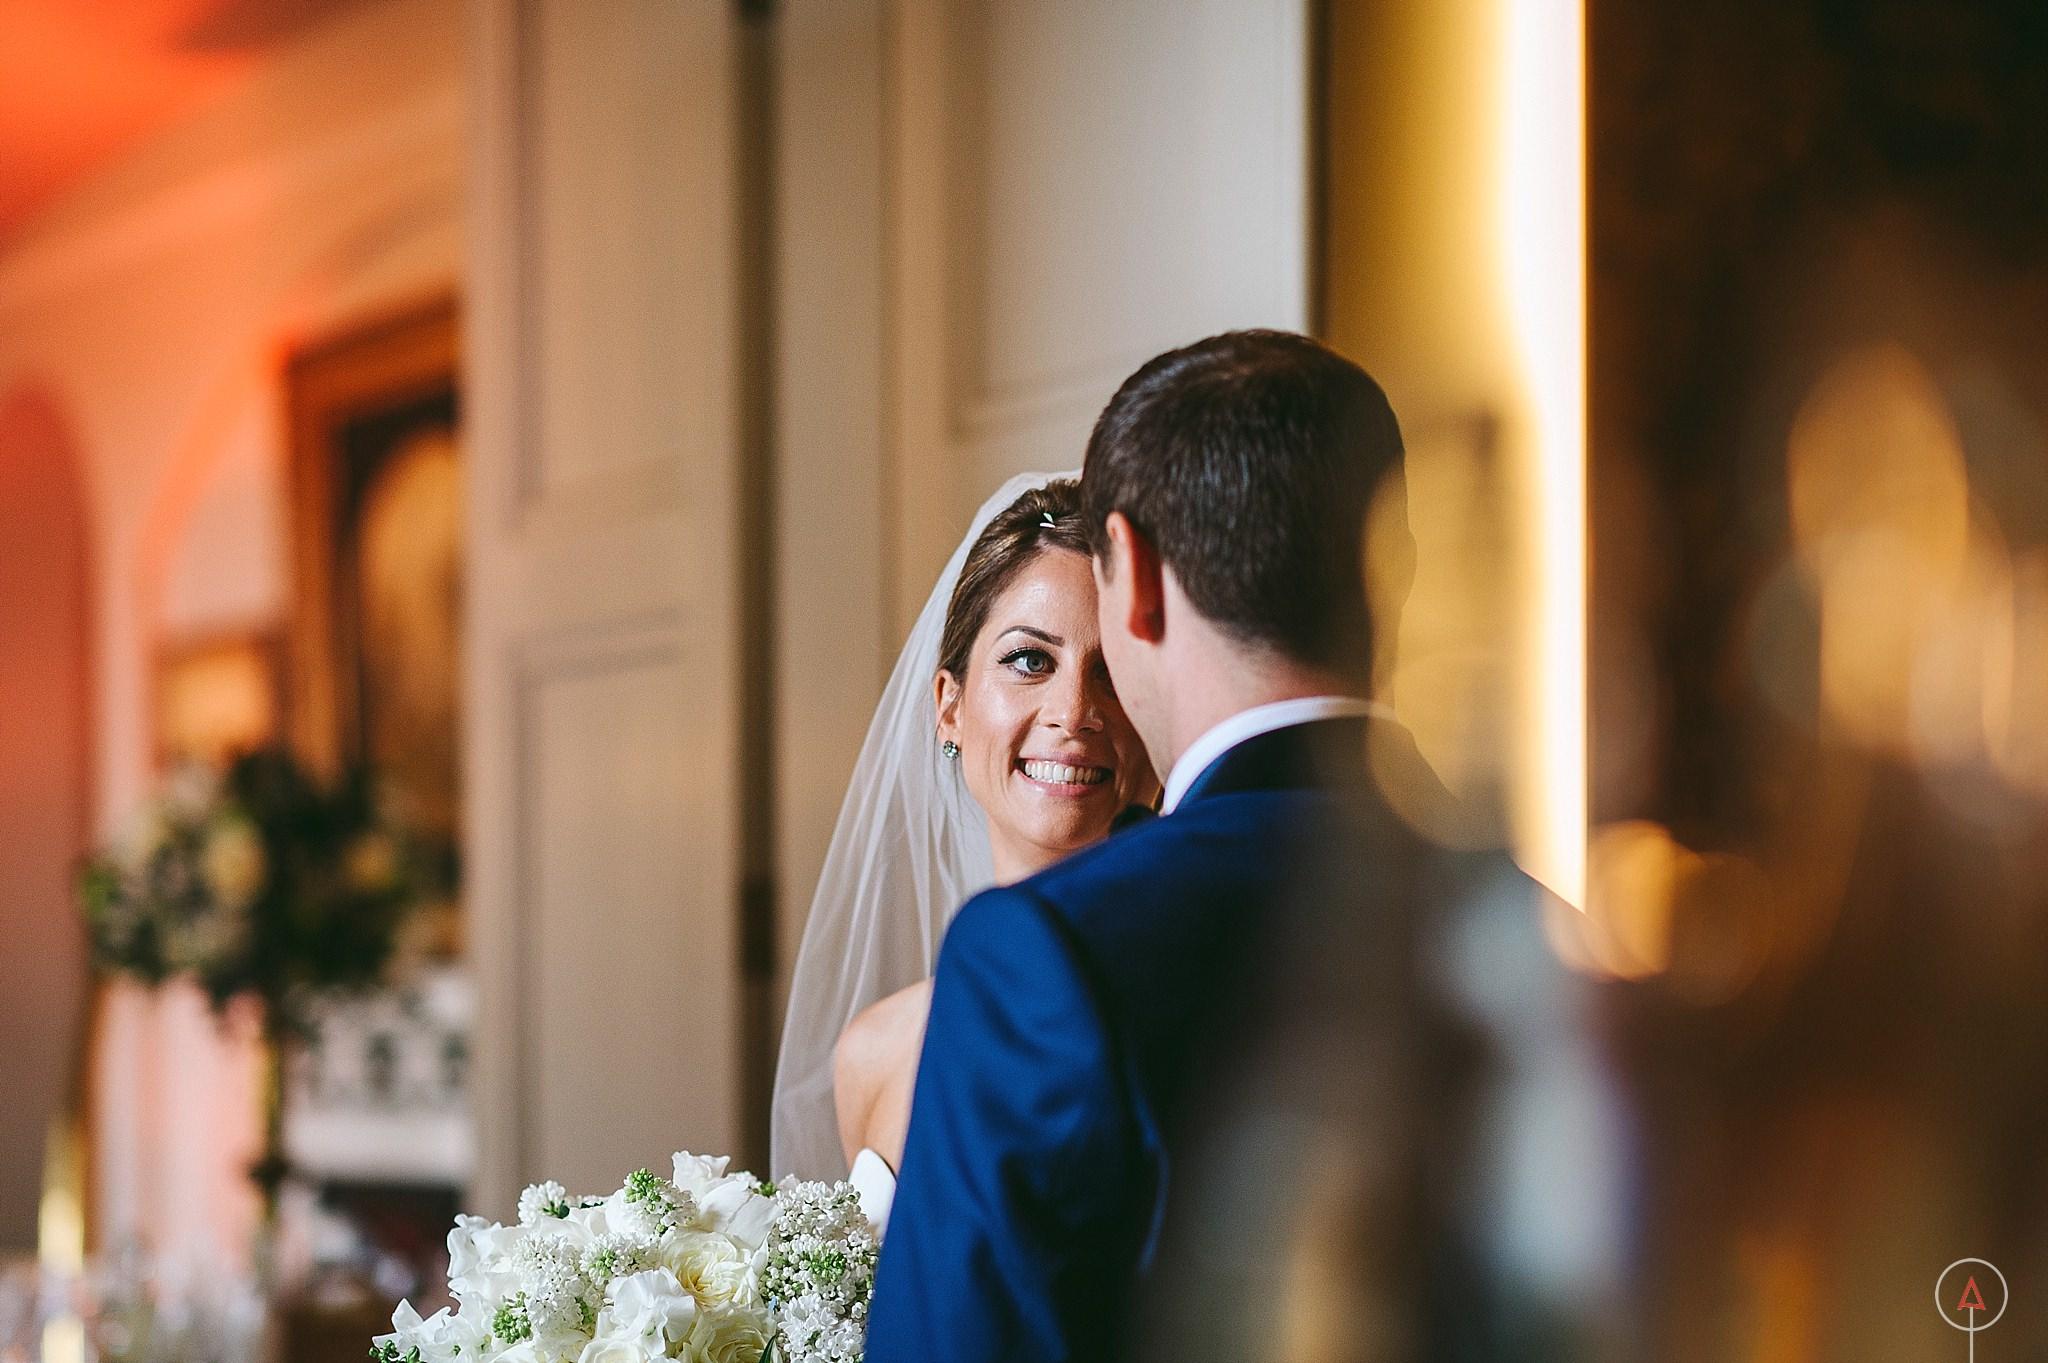 cardiff-wedding-photographer-aga-tomaszek_0260